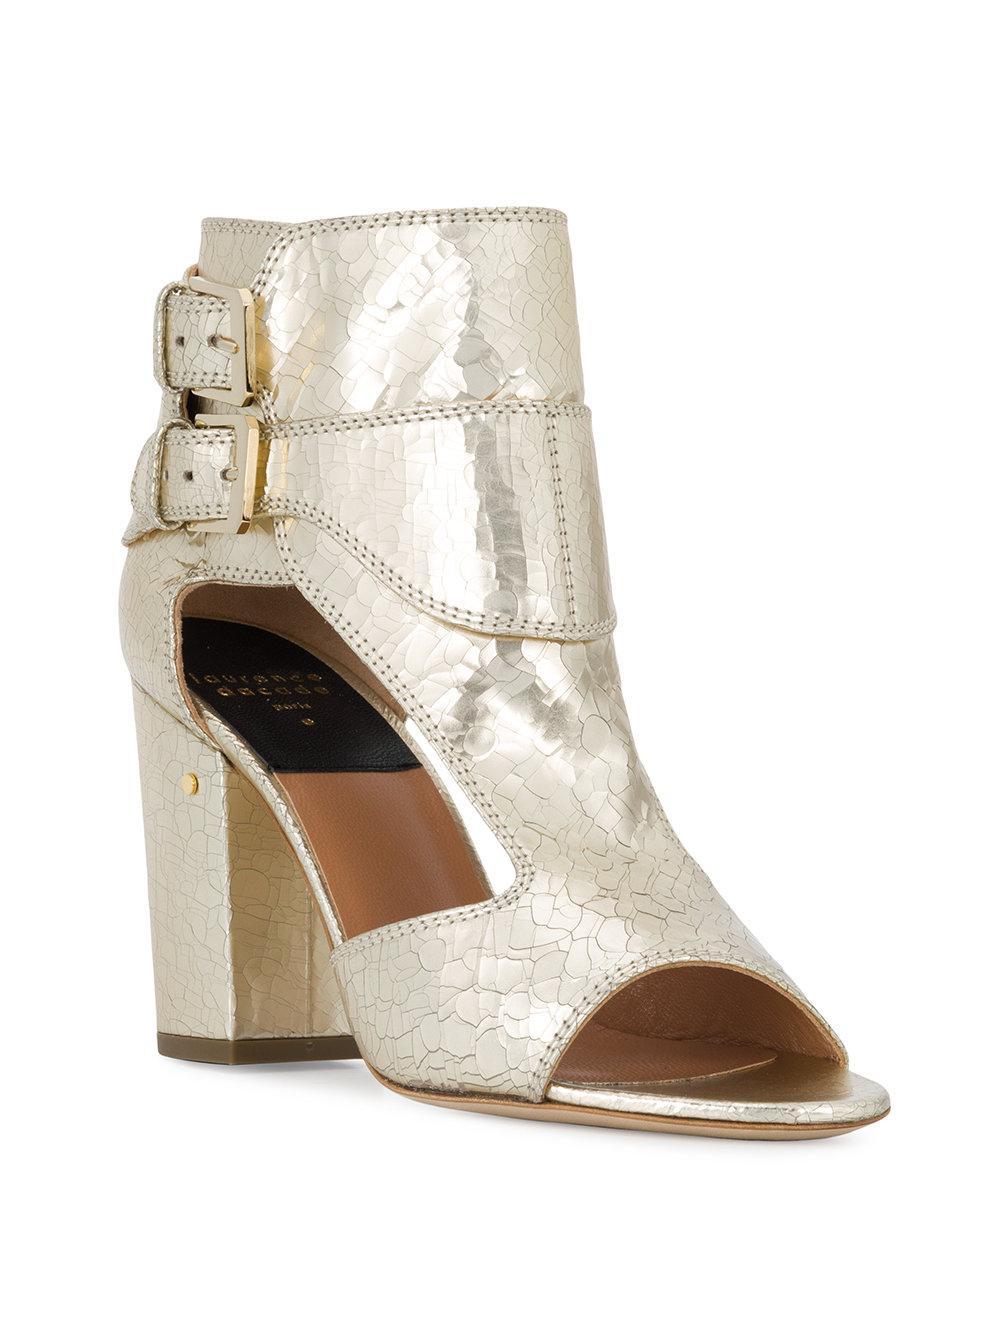 Rush buckled sandals - Metallic Laurence Dacade lKVT8Pz